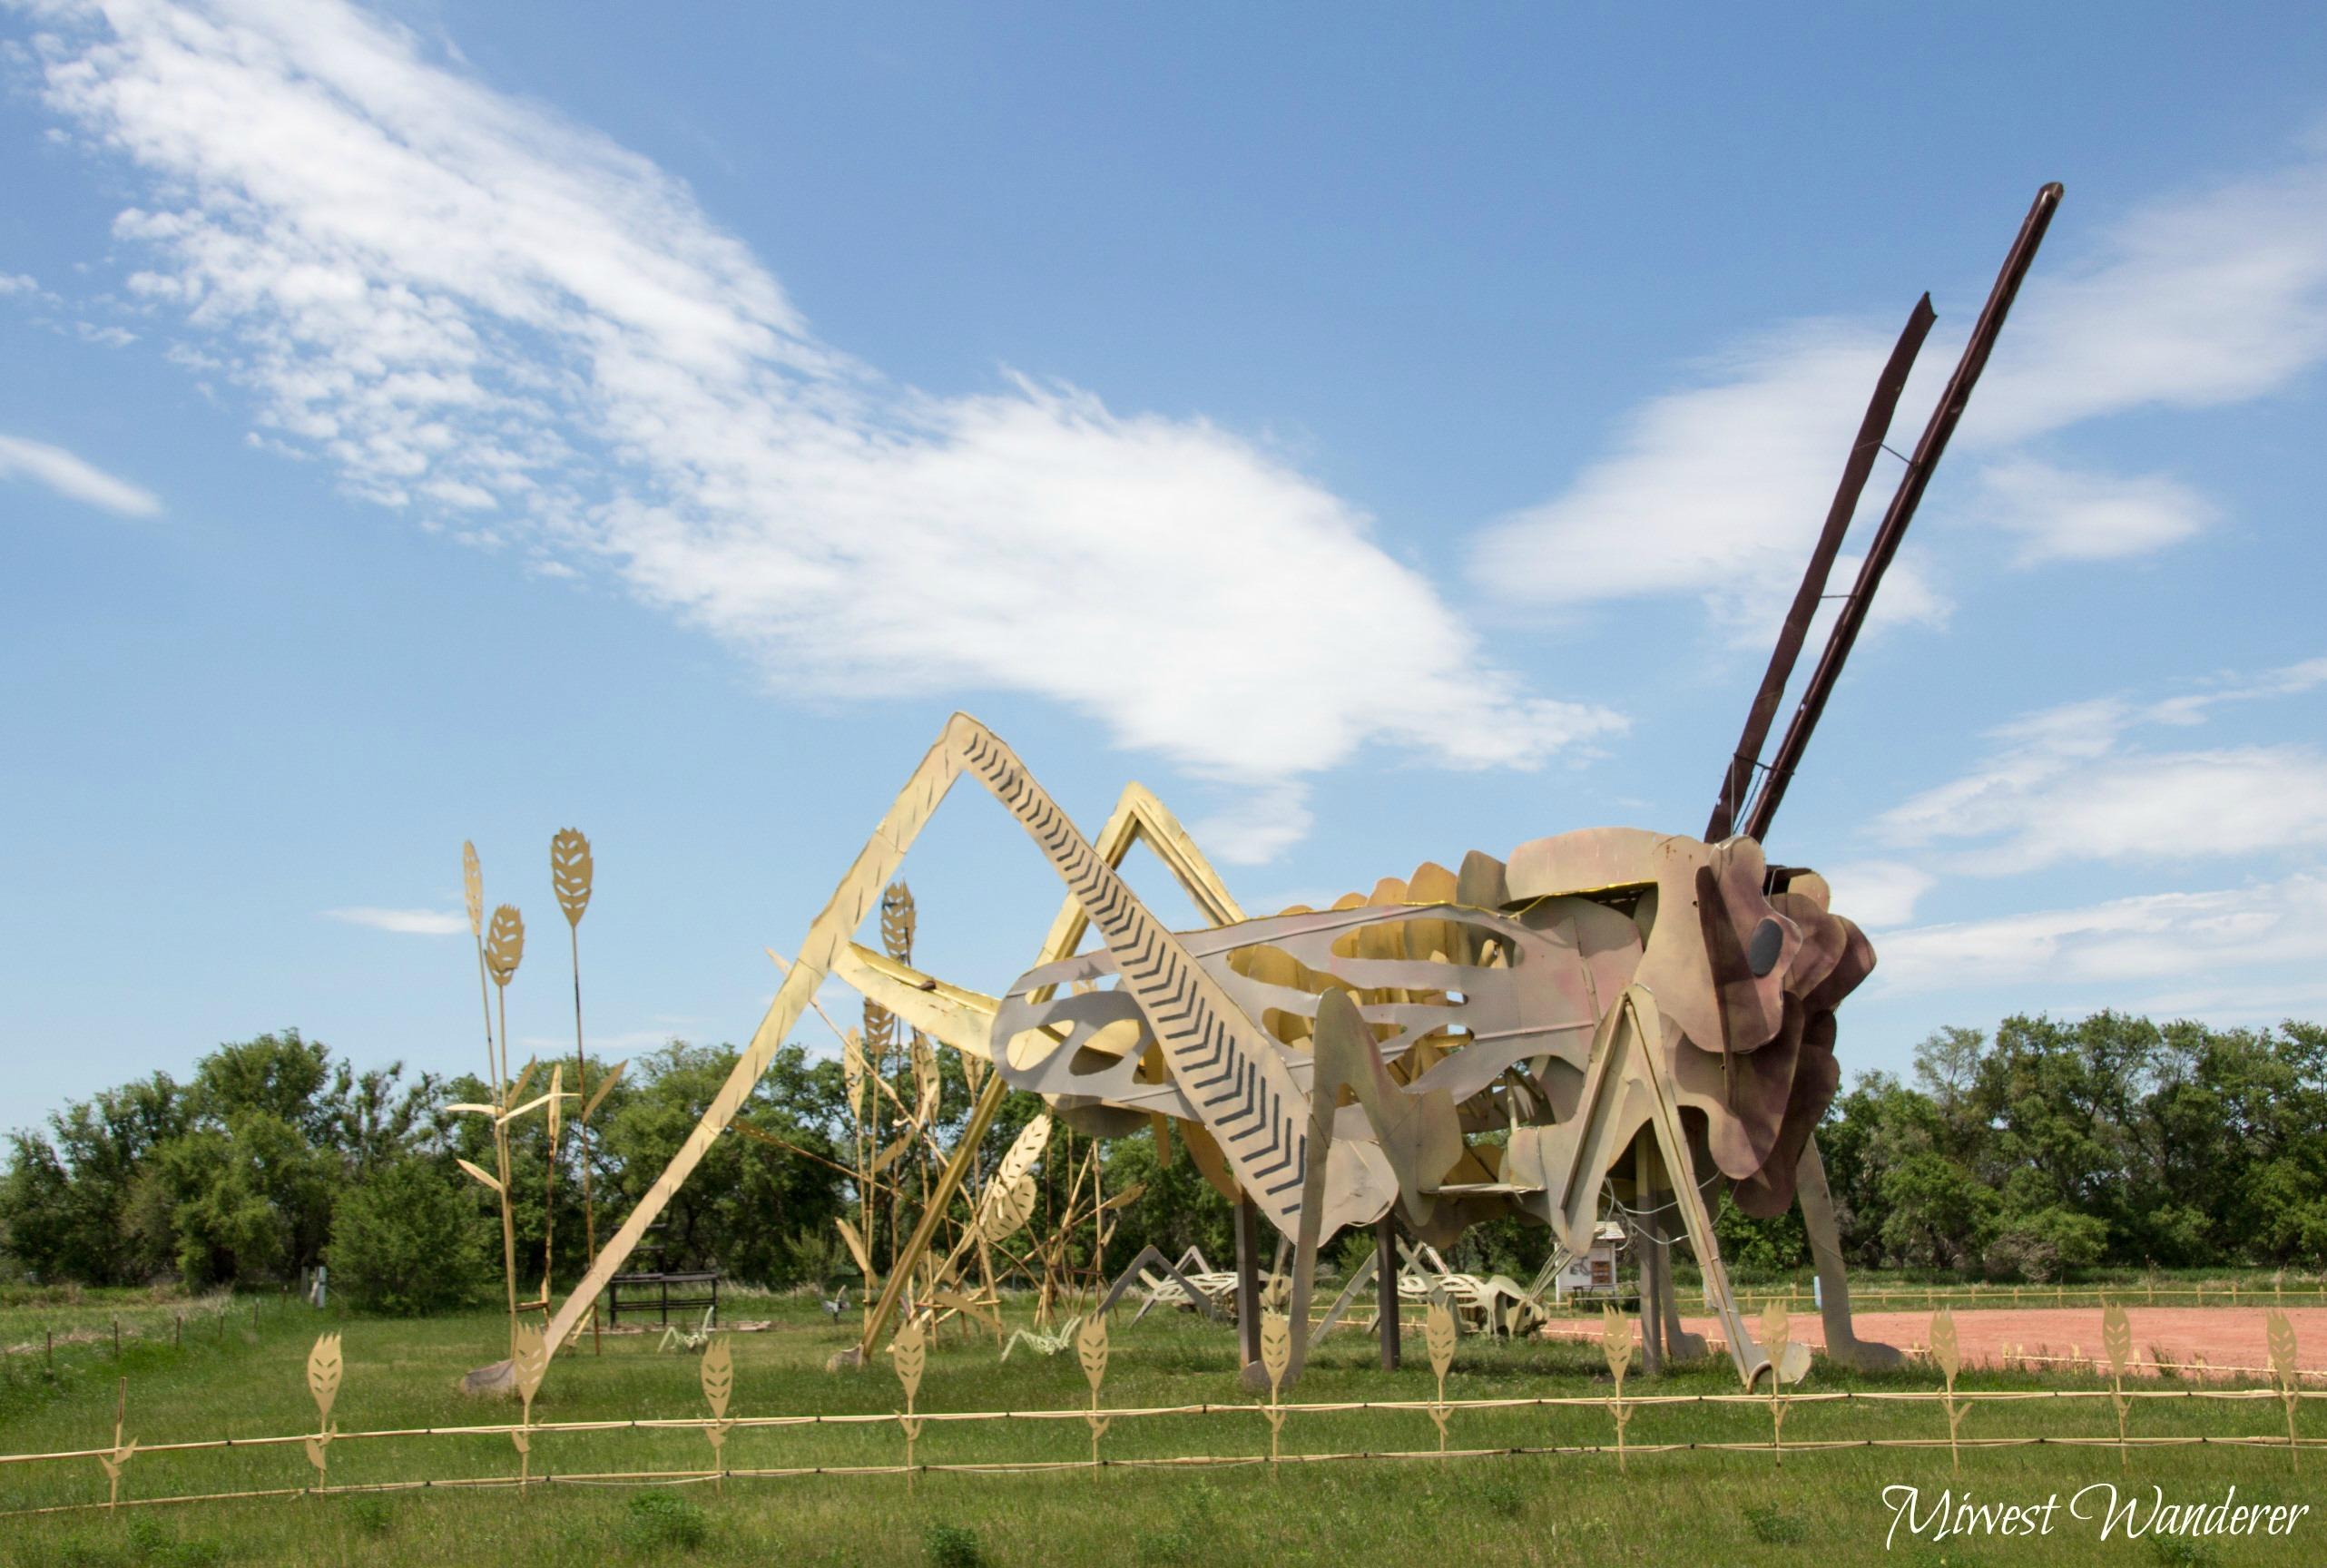 Grasshopper, Enchanted Highway